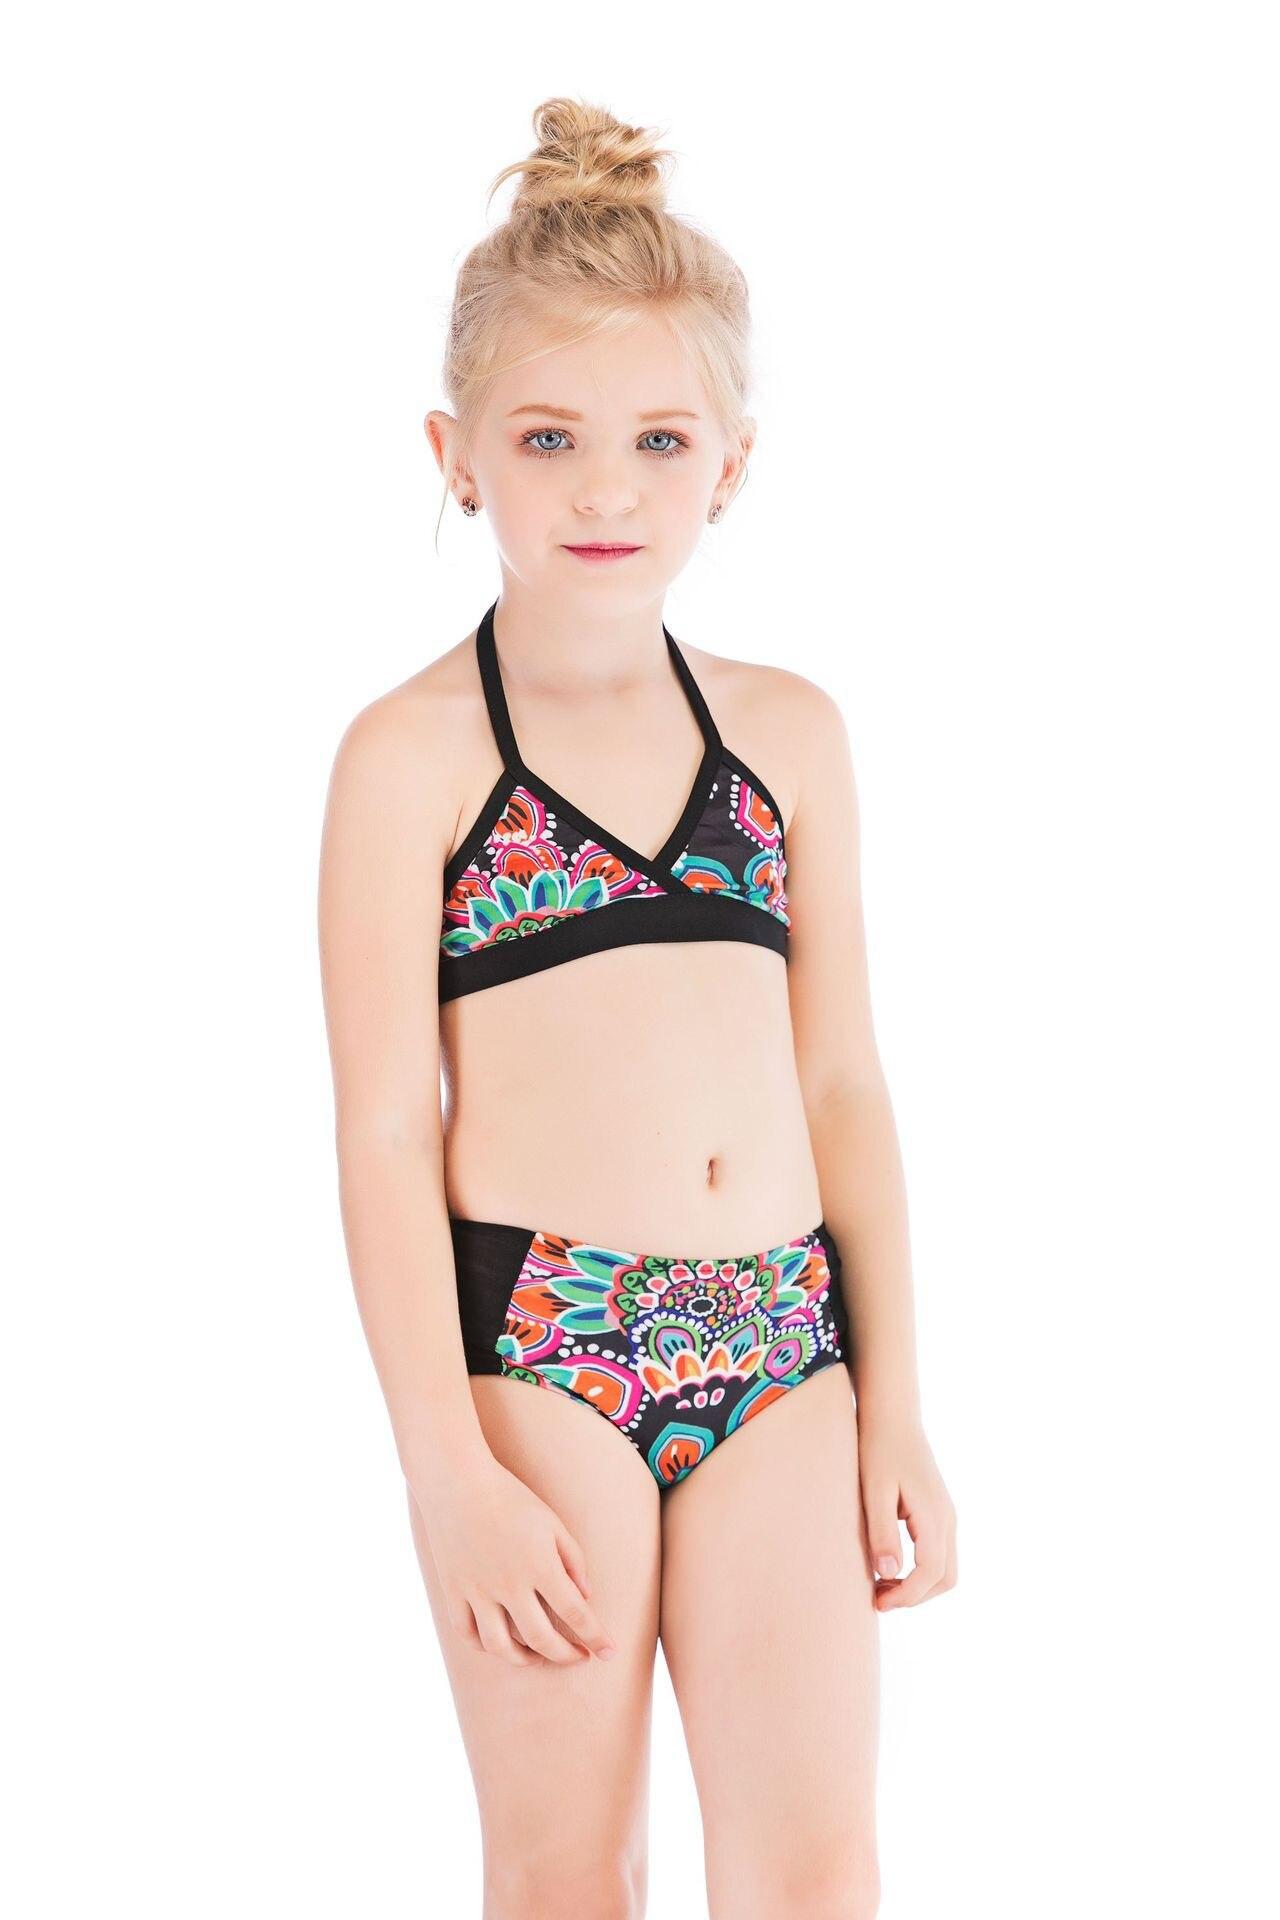 Western Style Girls' Shirt Hot Selling Bathing Suit Stripes Flower Split Type Bikini GIRL'S Swimsuit